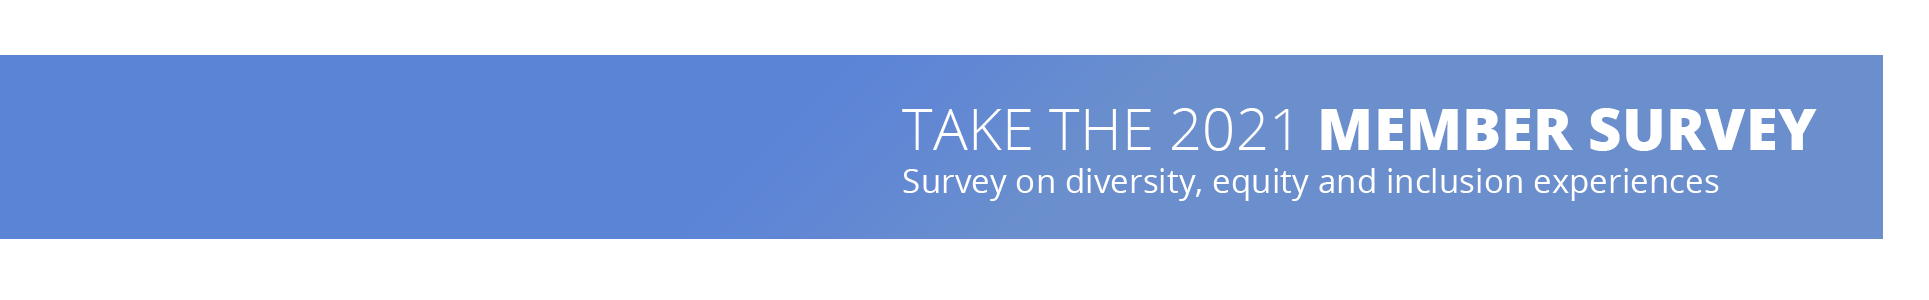 take the 2021 member survey